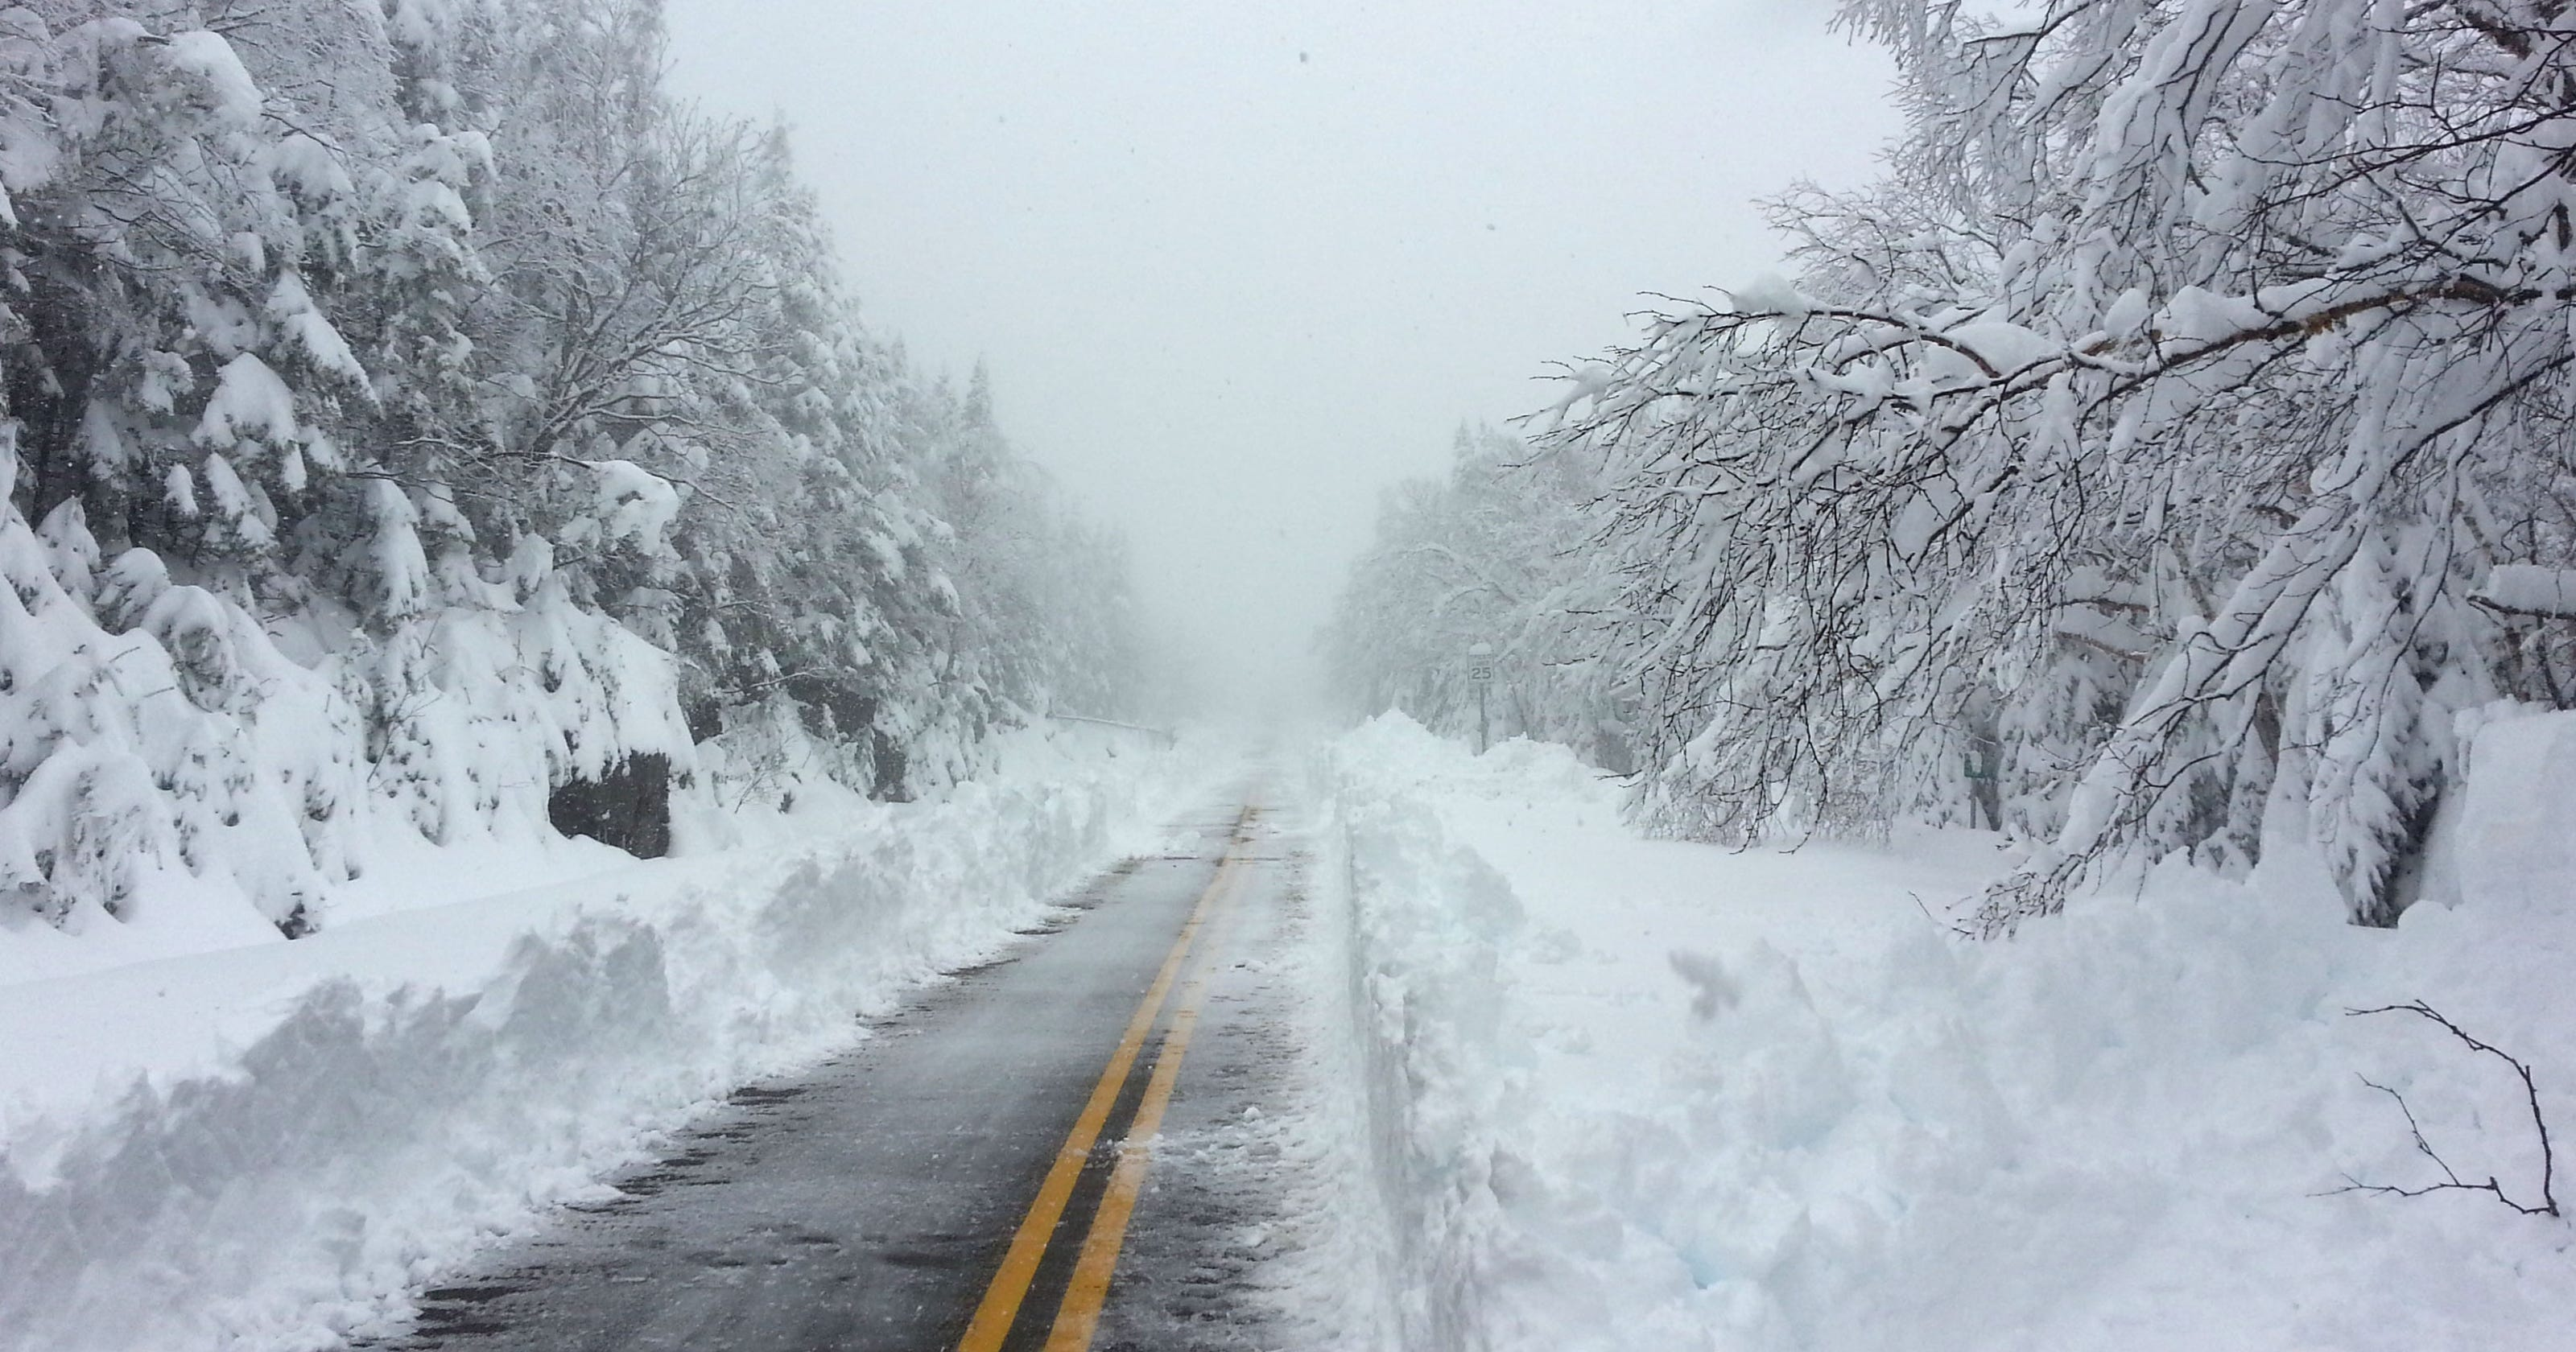 Memorial Day mess: 3 feet of snow falls in Upstate N Y